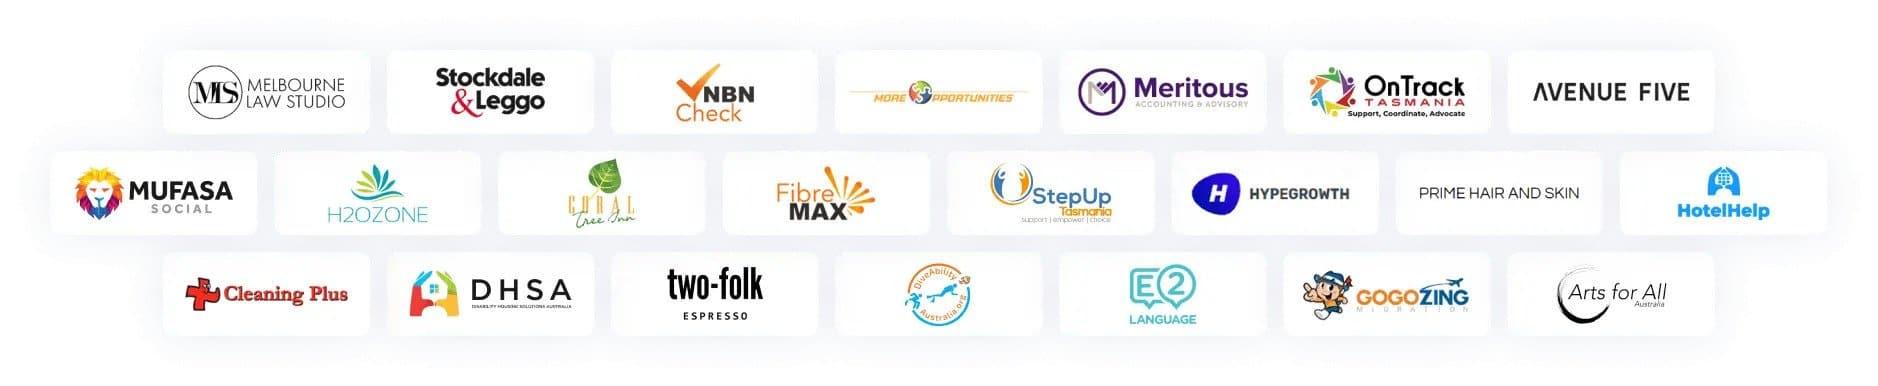 social fox melbourne client logos